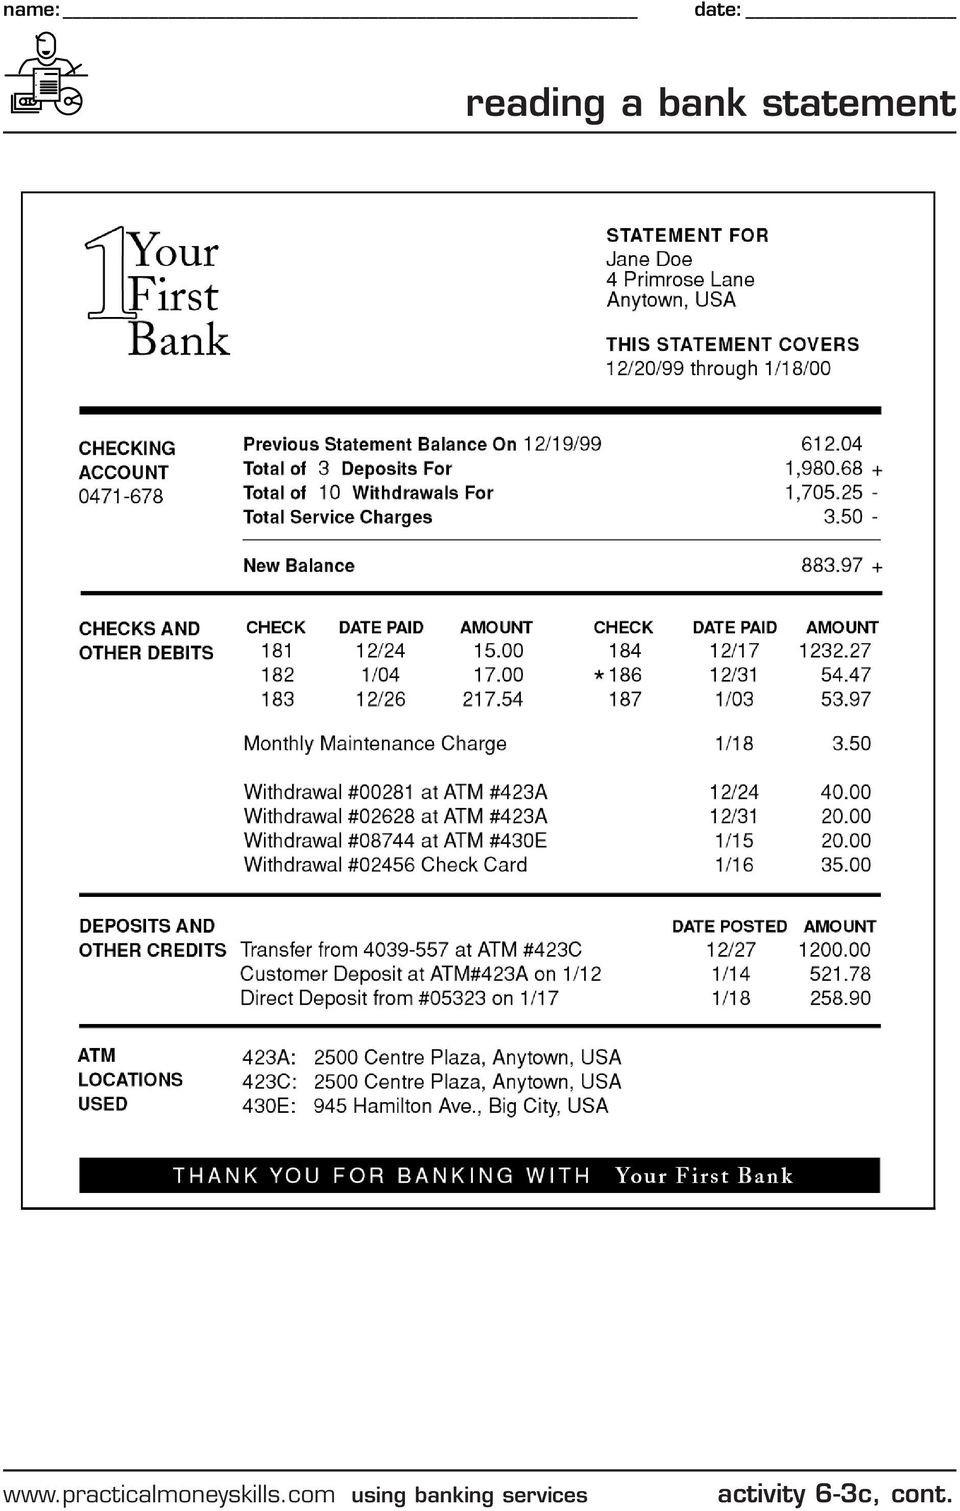 Reconciling A Bank Statement Worksheet Keeping A Running Balance Pdf Free Download